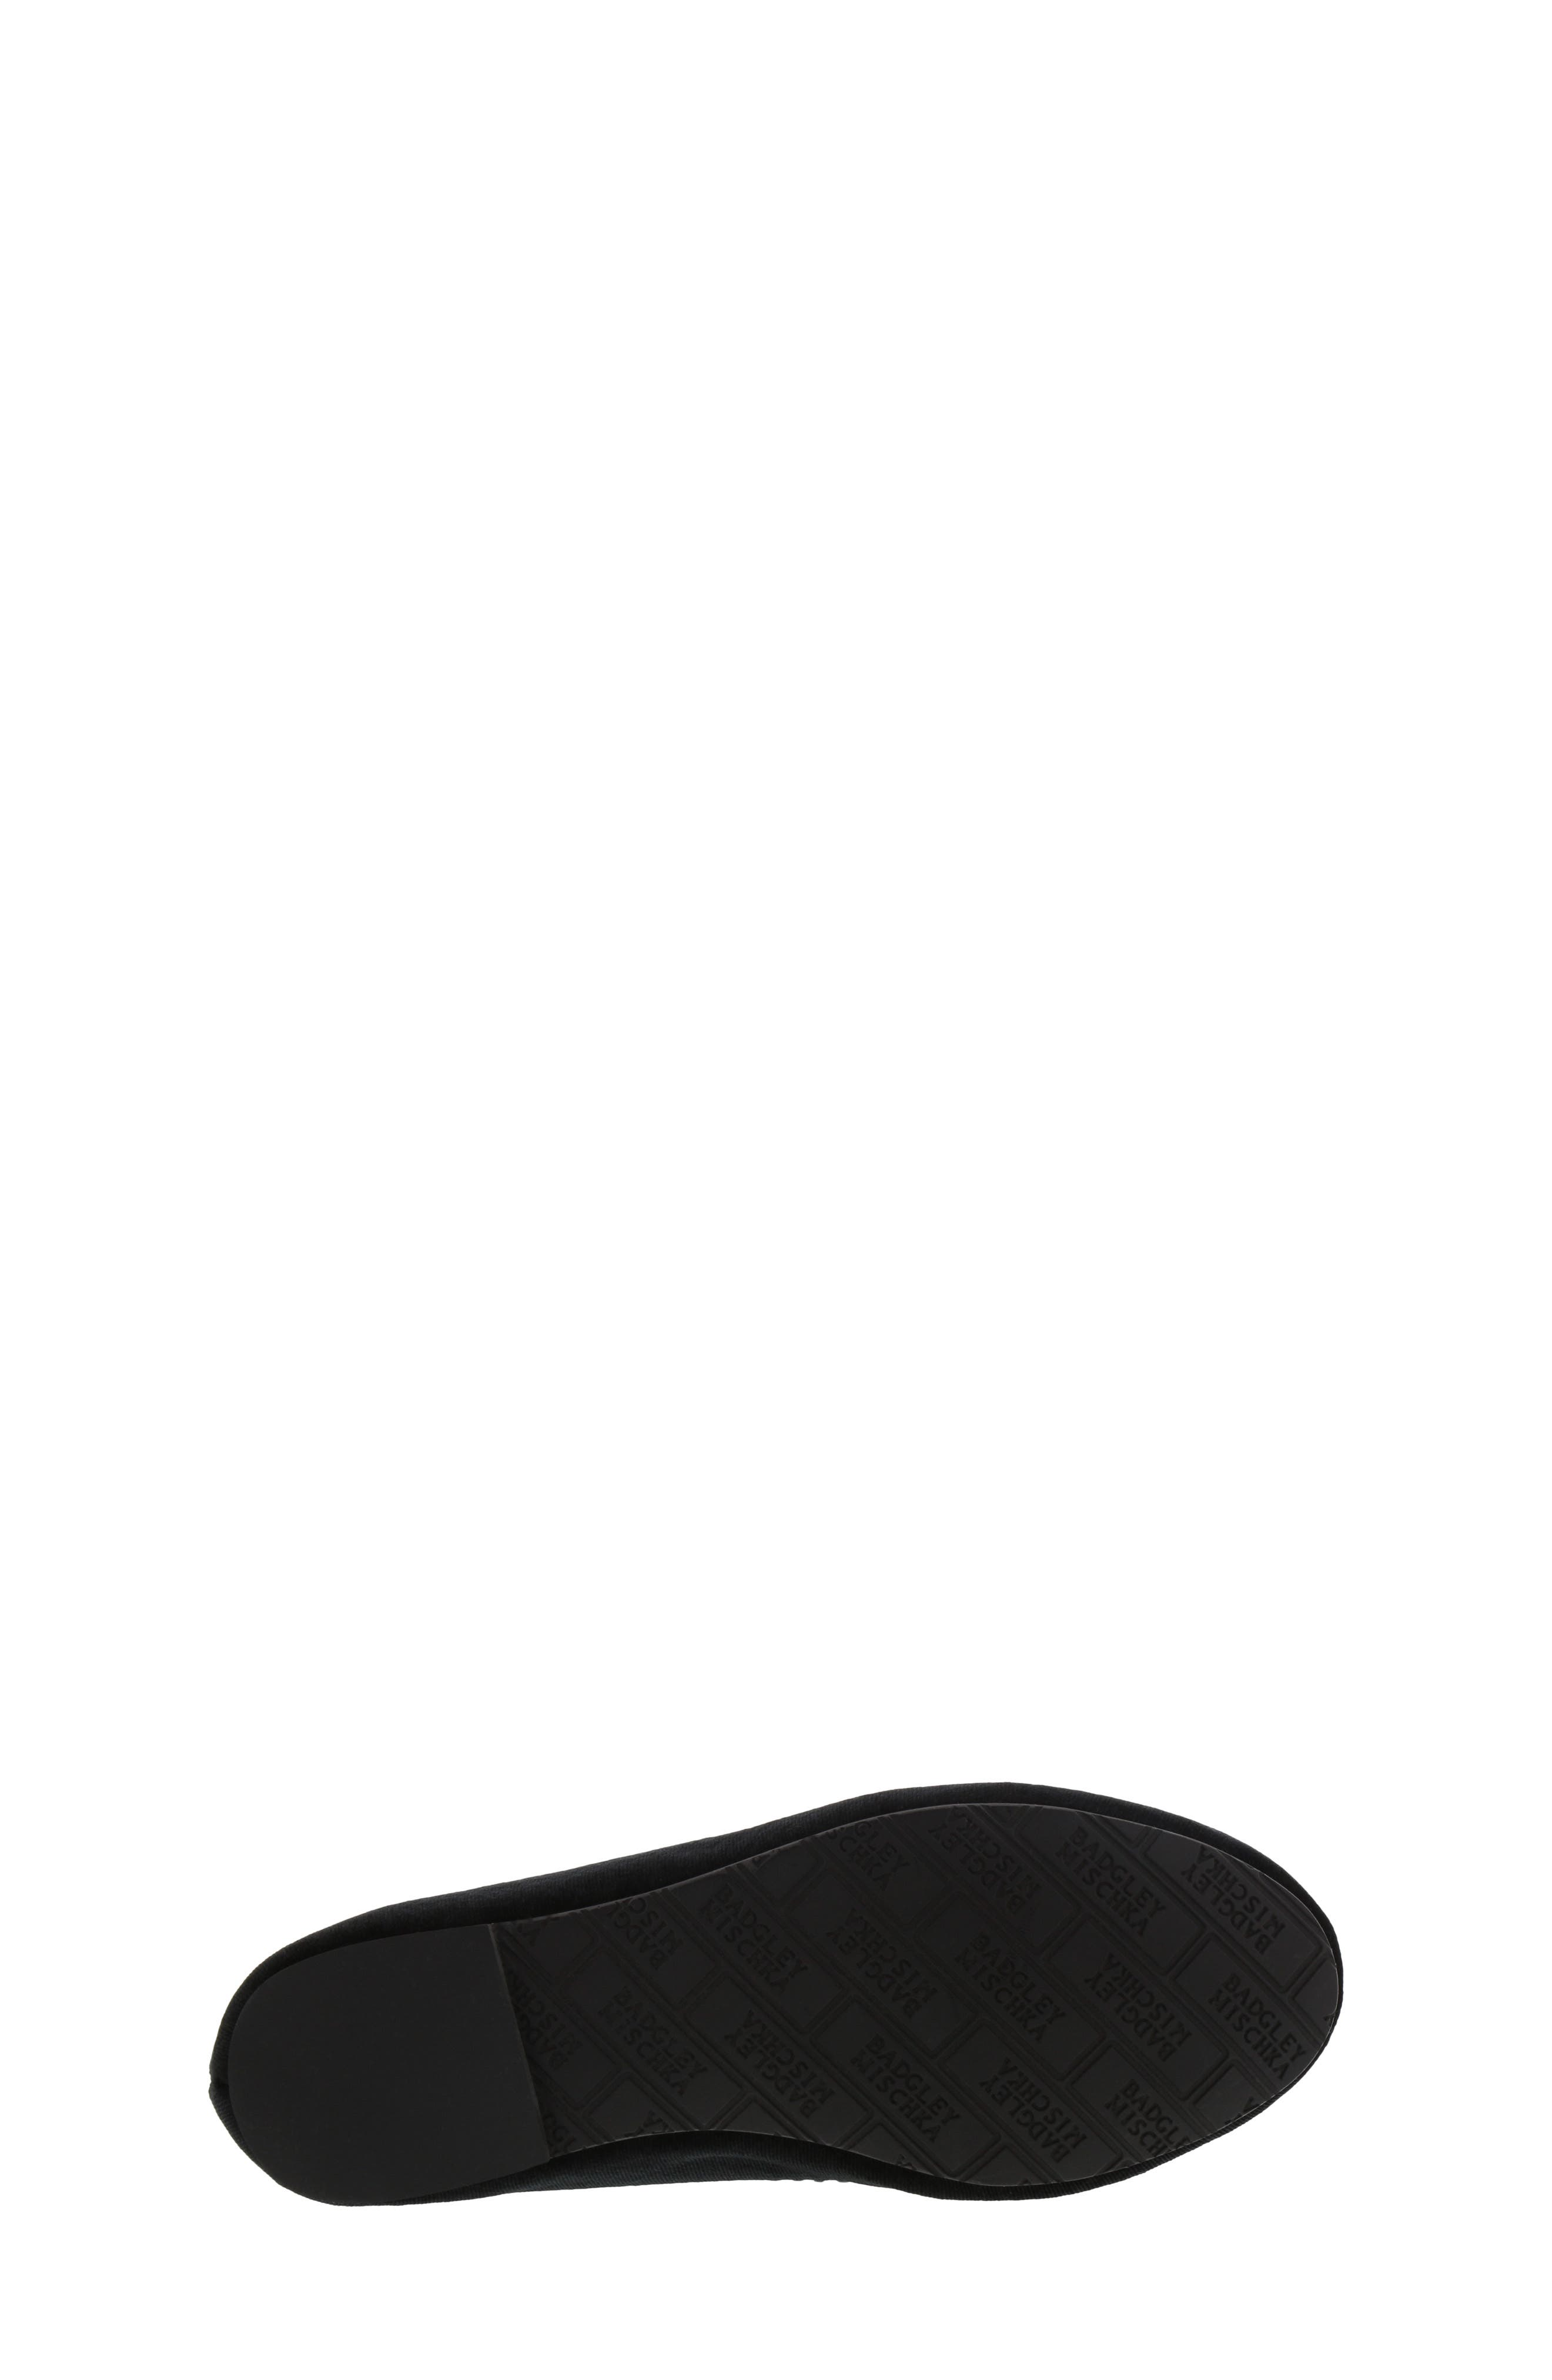 Badgley Mischka Amber Scallop Embellished Flat,                             Alternate thumbnail 6, color,                             BLACK